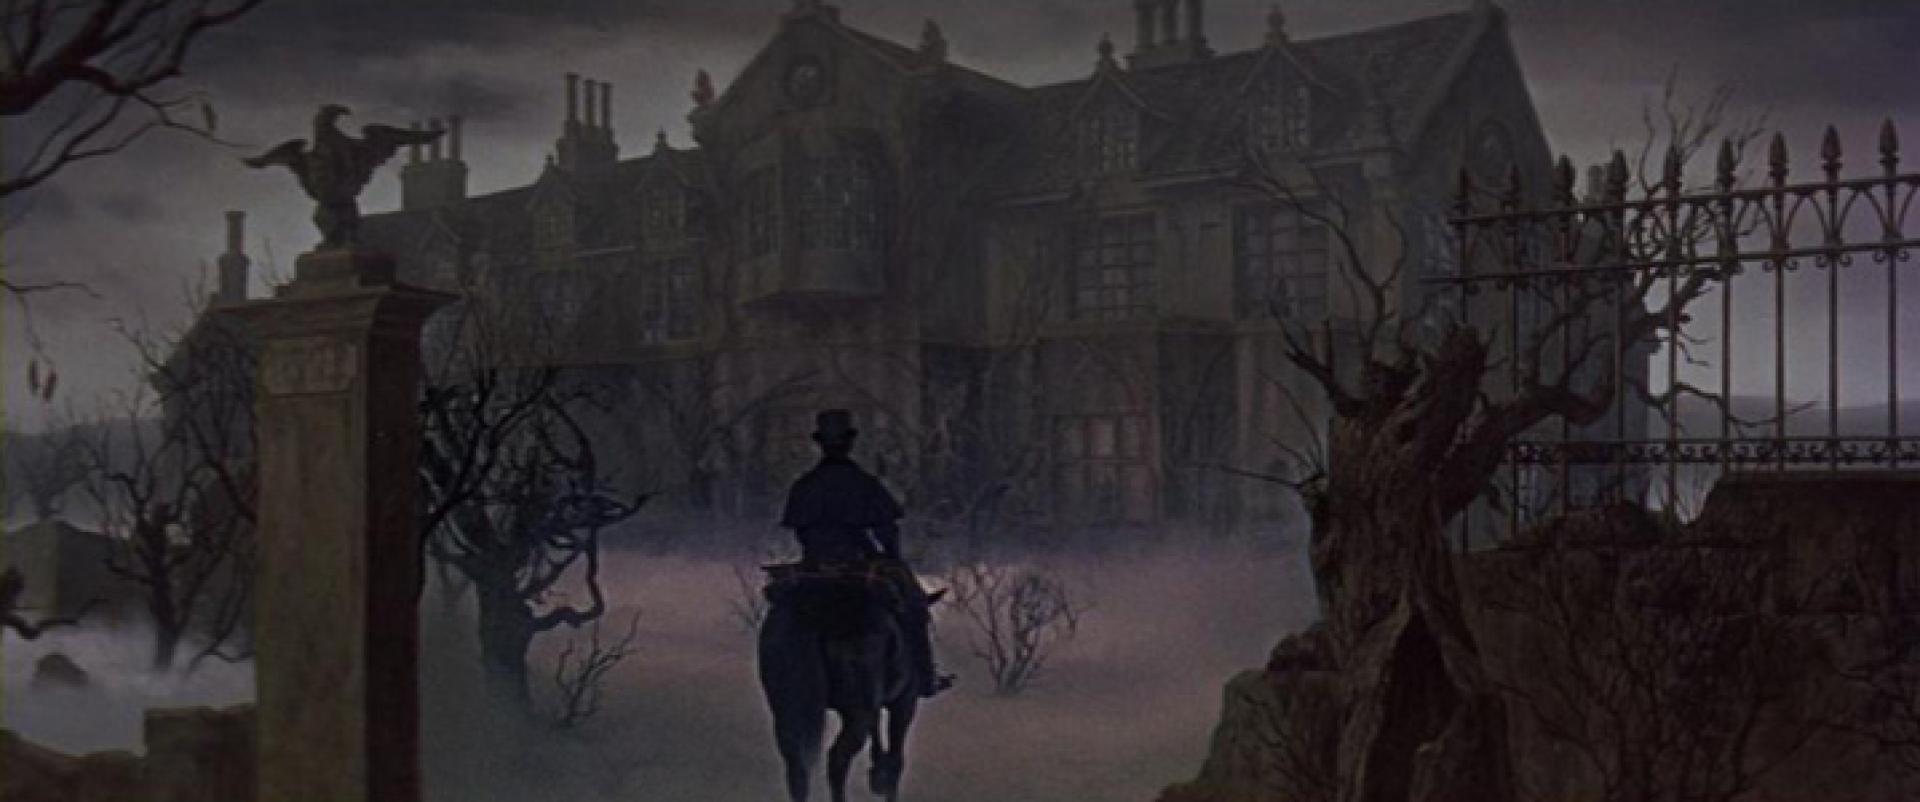 House of Usher - Az Usher-ház bukása (1960)